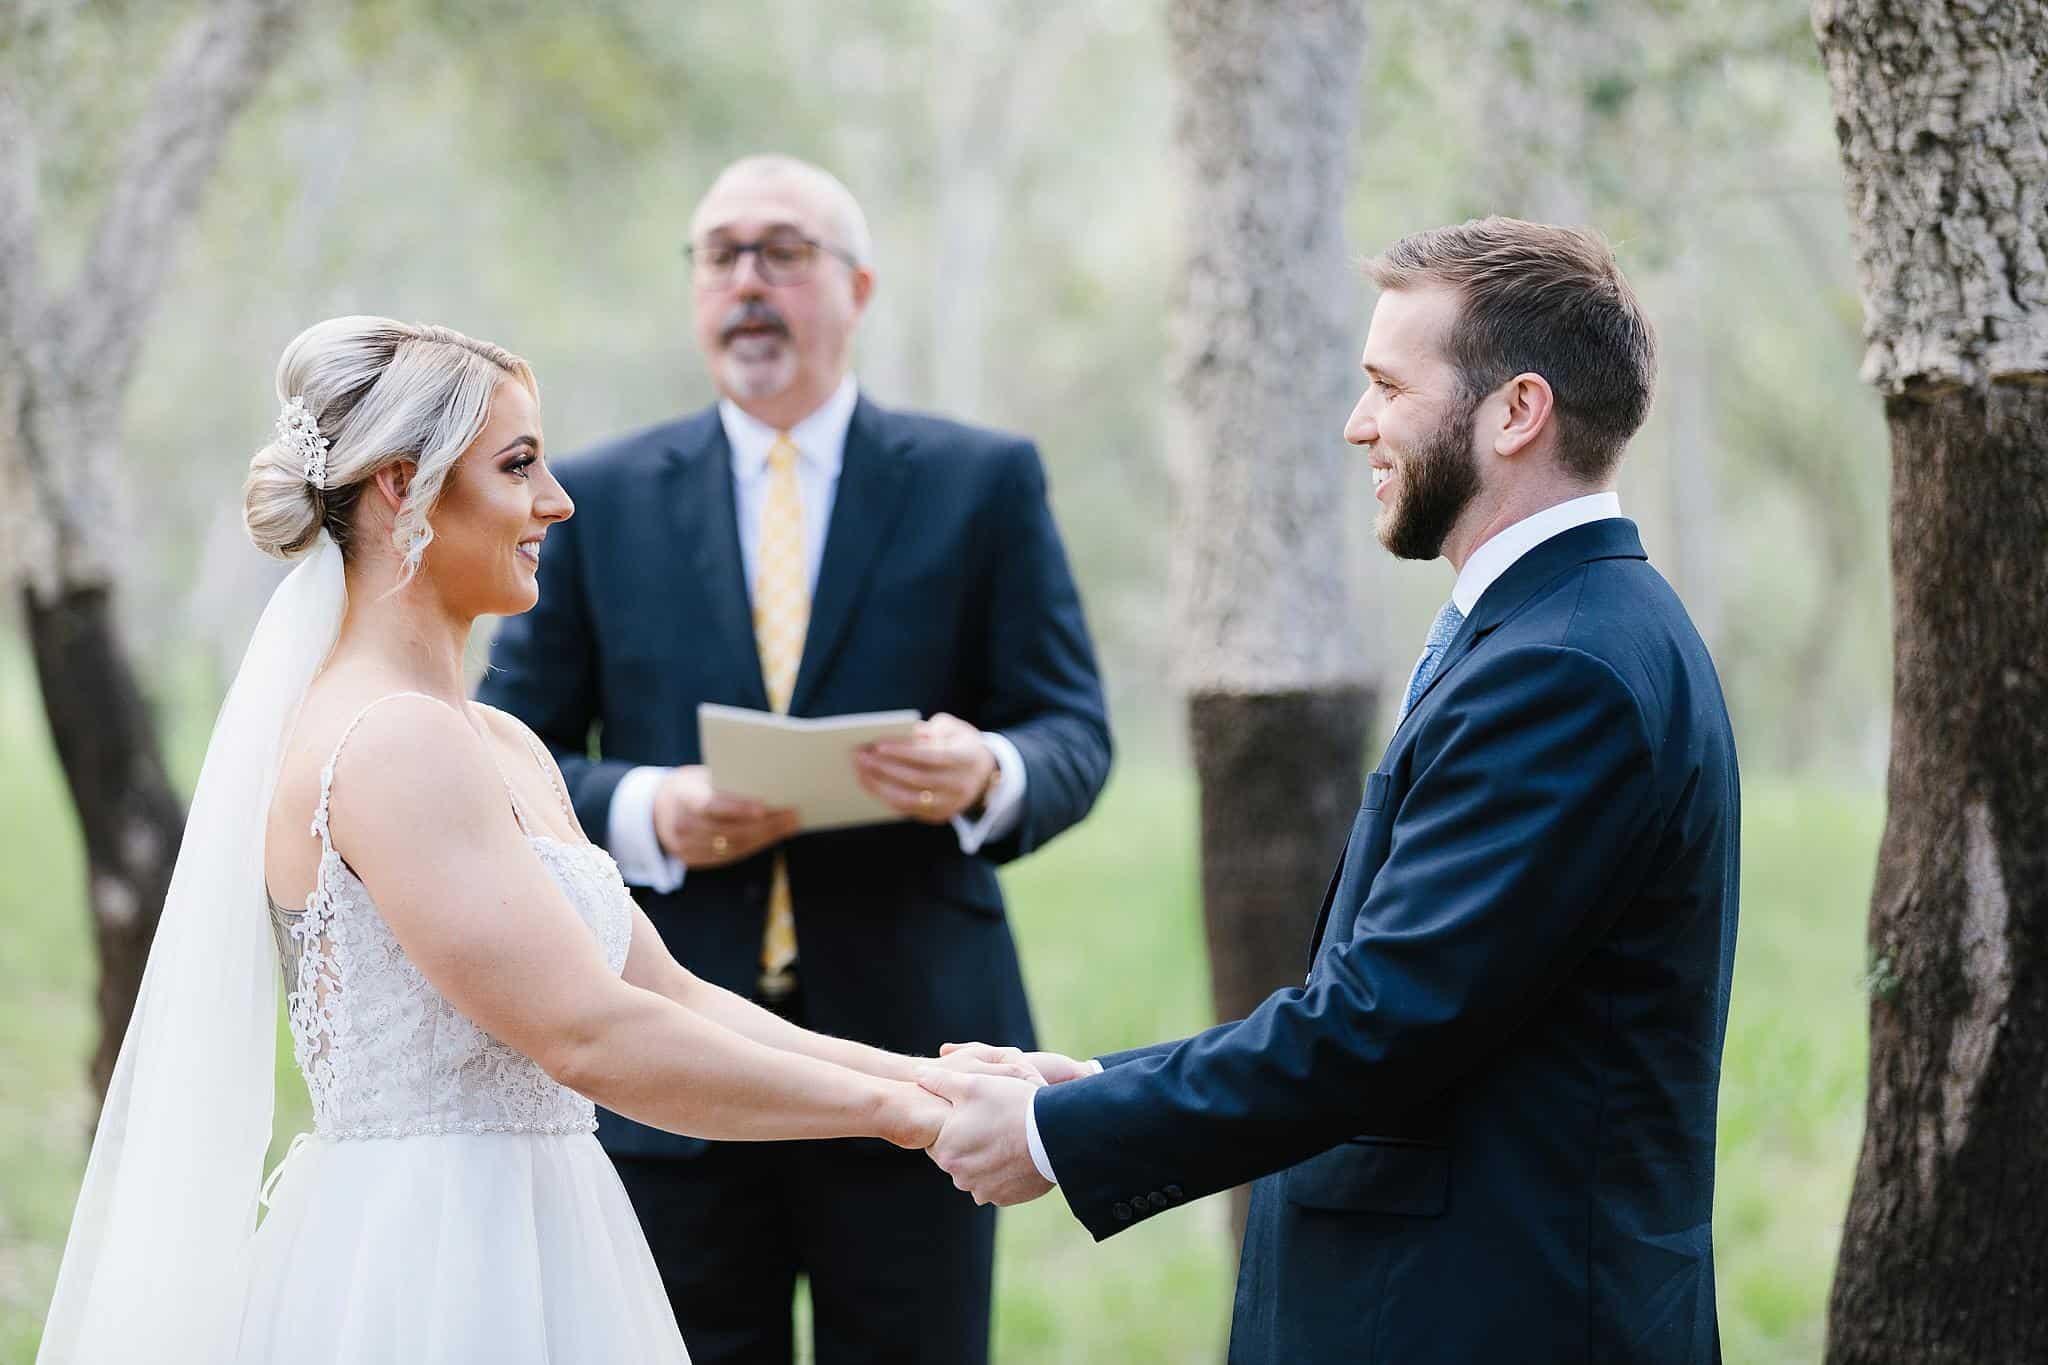 Michael Bower officiates wedding